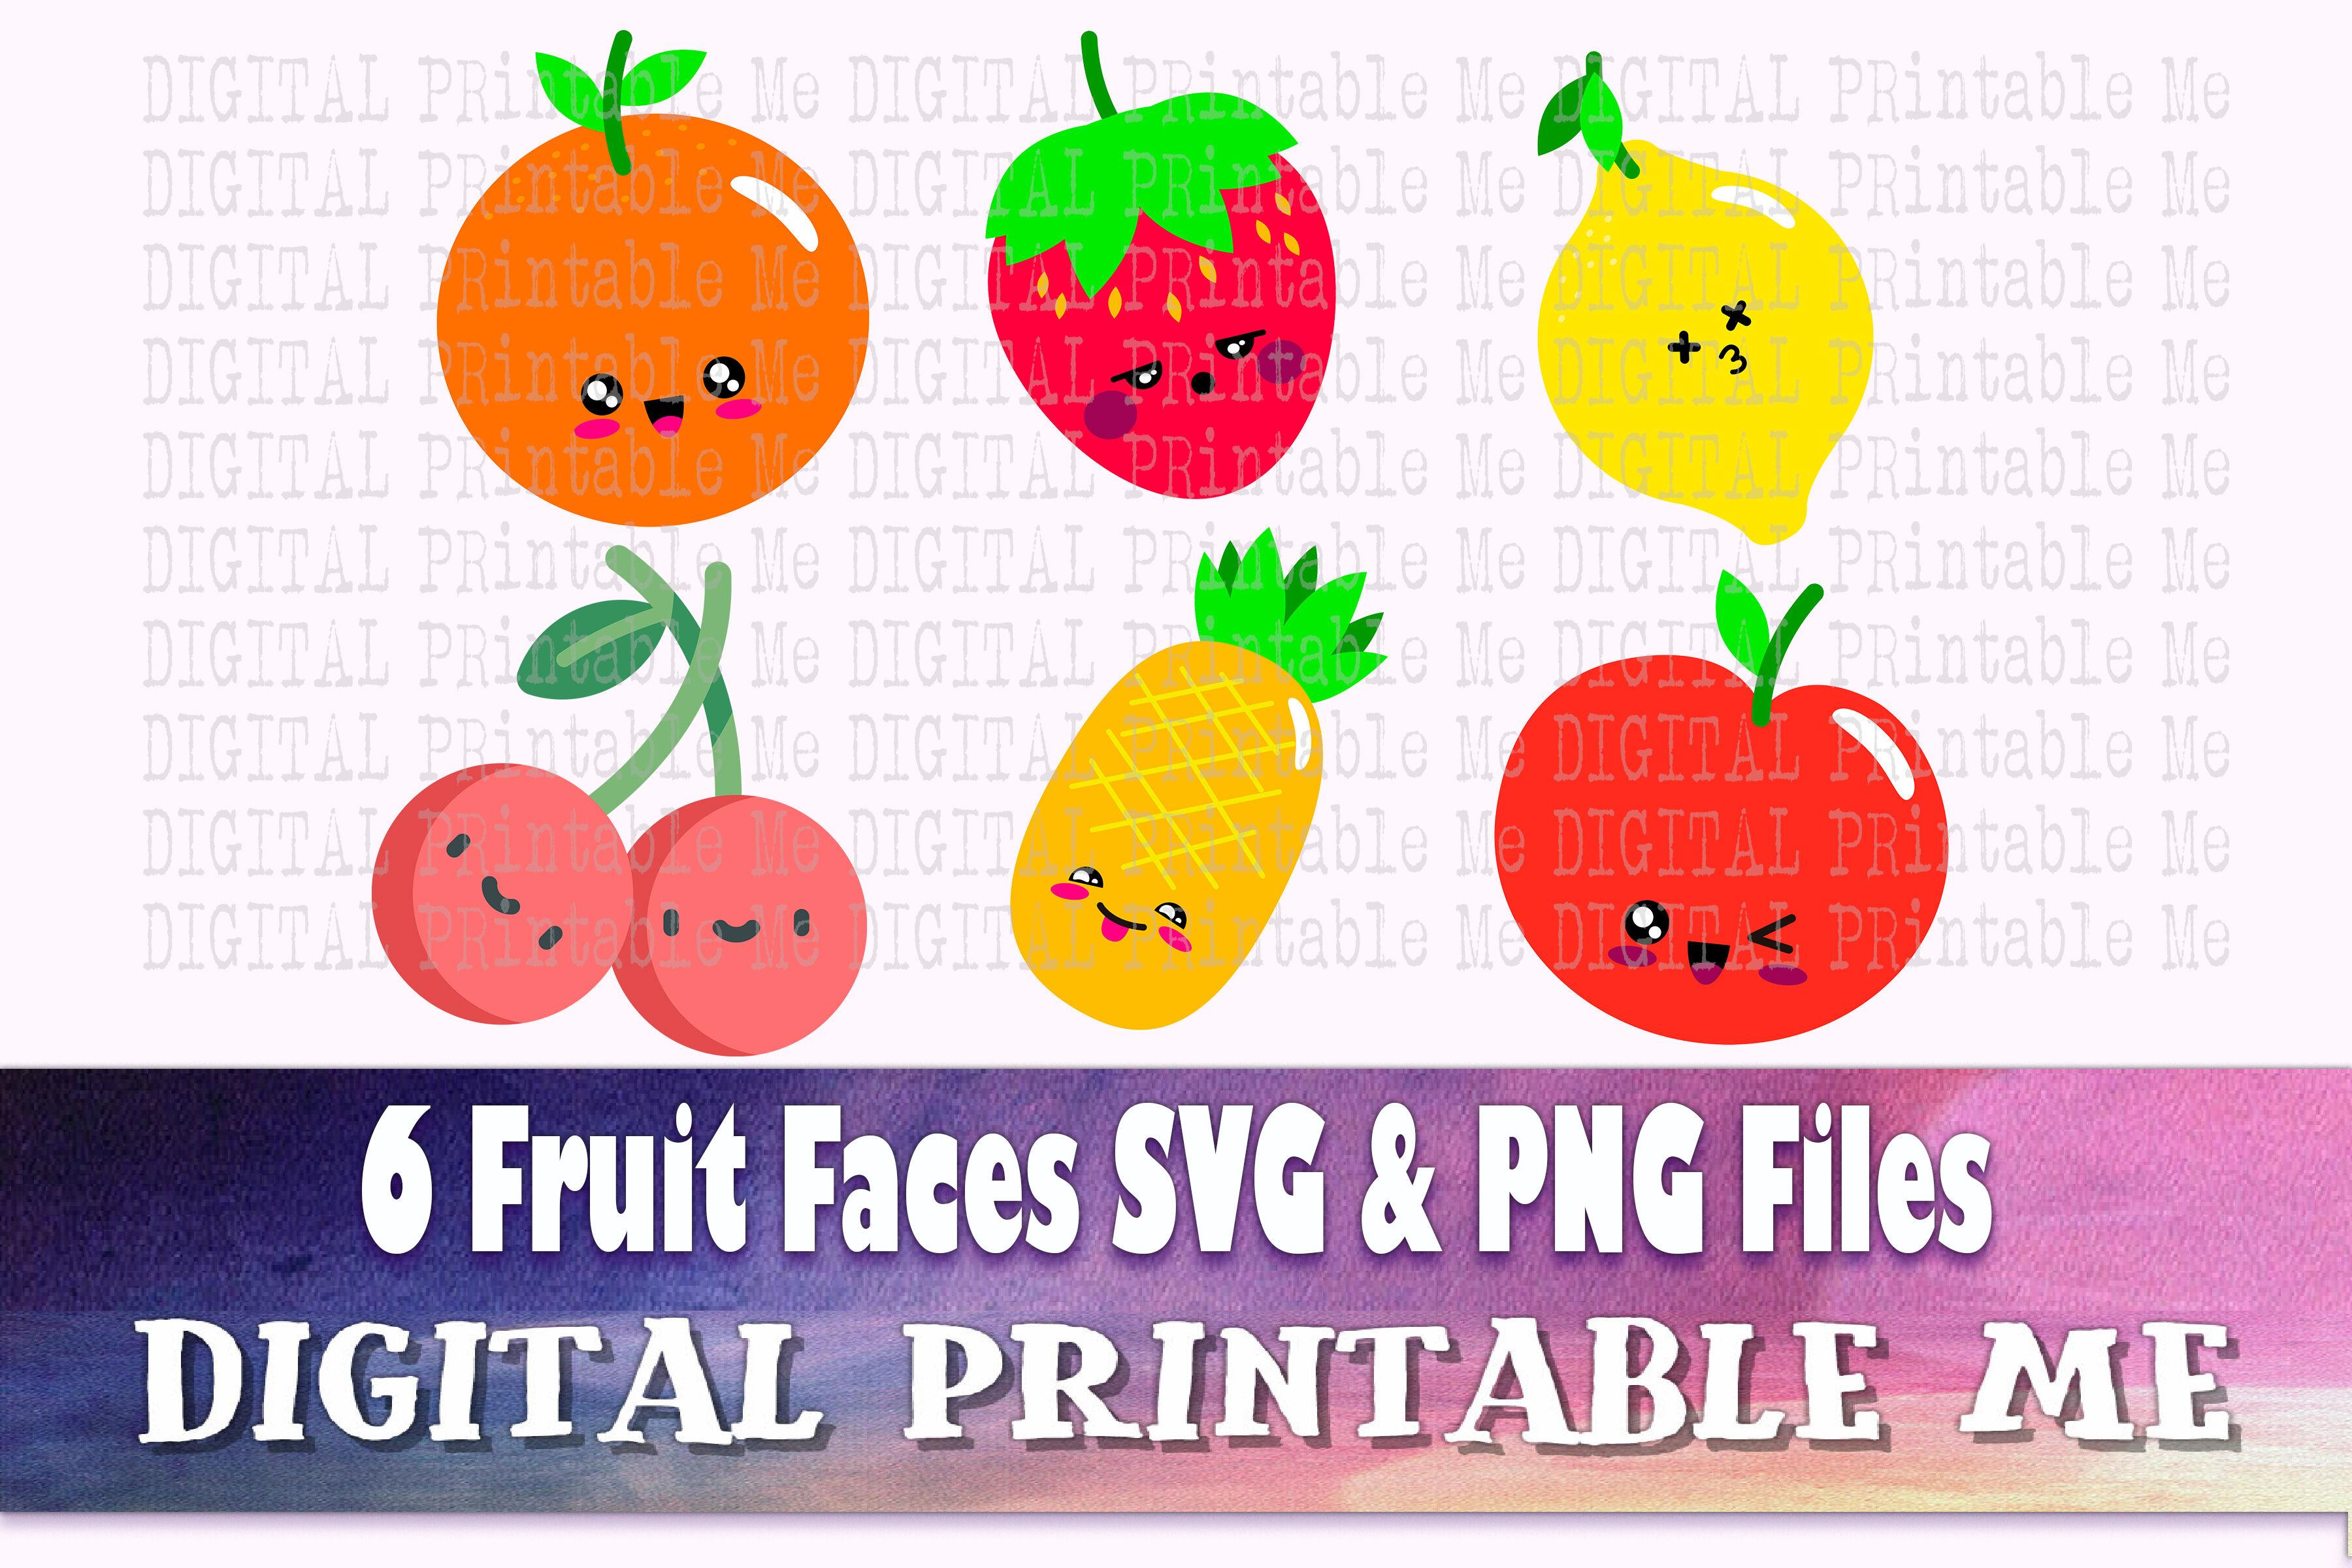 Smiling Fruit Svg Bundle Clip Art Png 6 Image Pack Digital Cut Fi By Digitalprintableme Thehungryjpeg Com